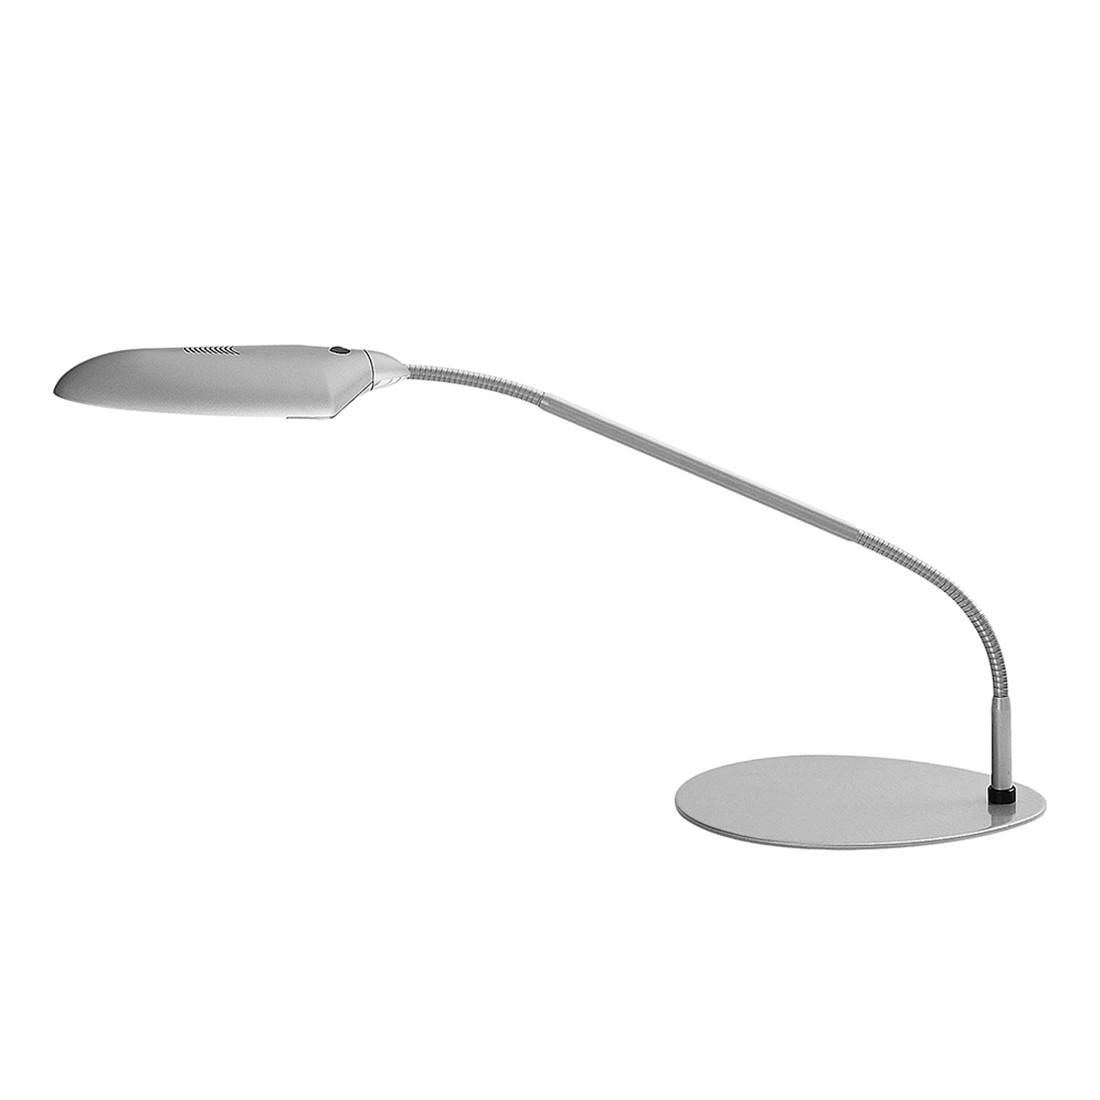 Tischleuchte GE ● Metall/Kunststoff ● Grau ● 2-flammig- Blanke Design A